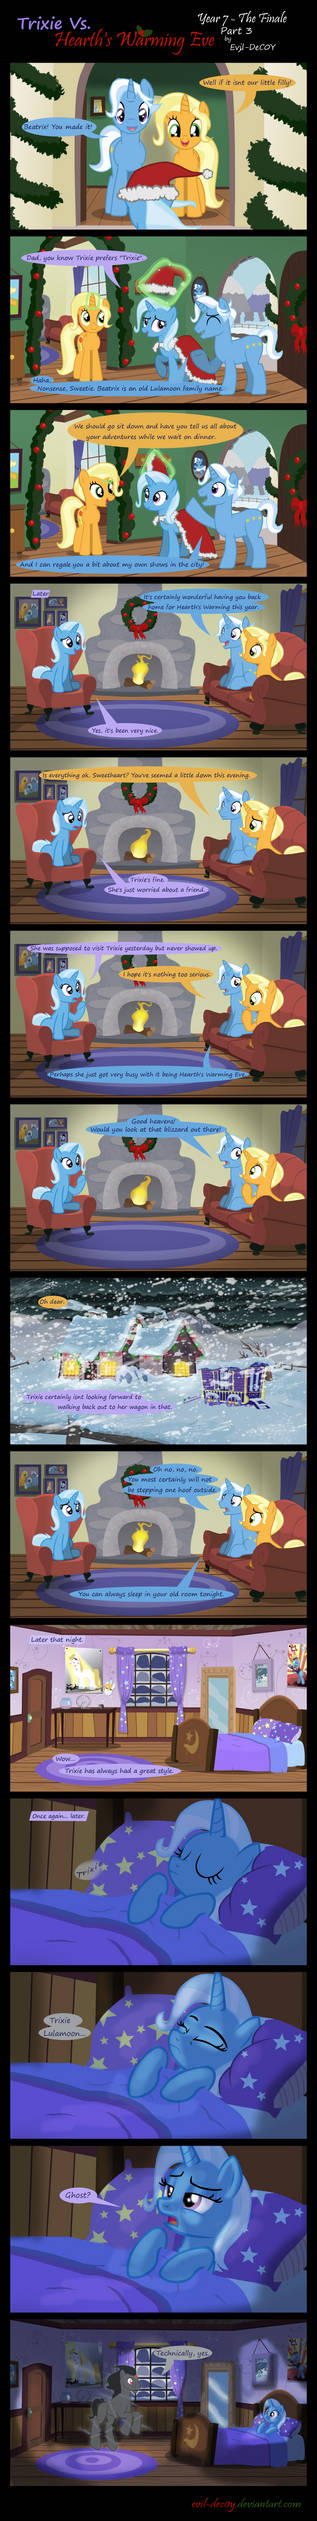 Trixie Vs. Hearth's Warming Eve: Finale (Part 3)